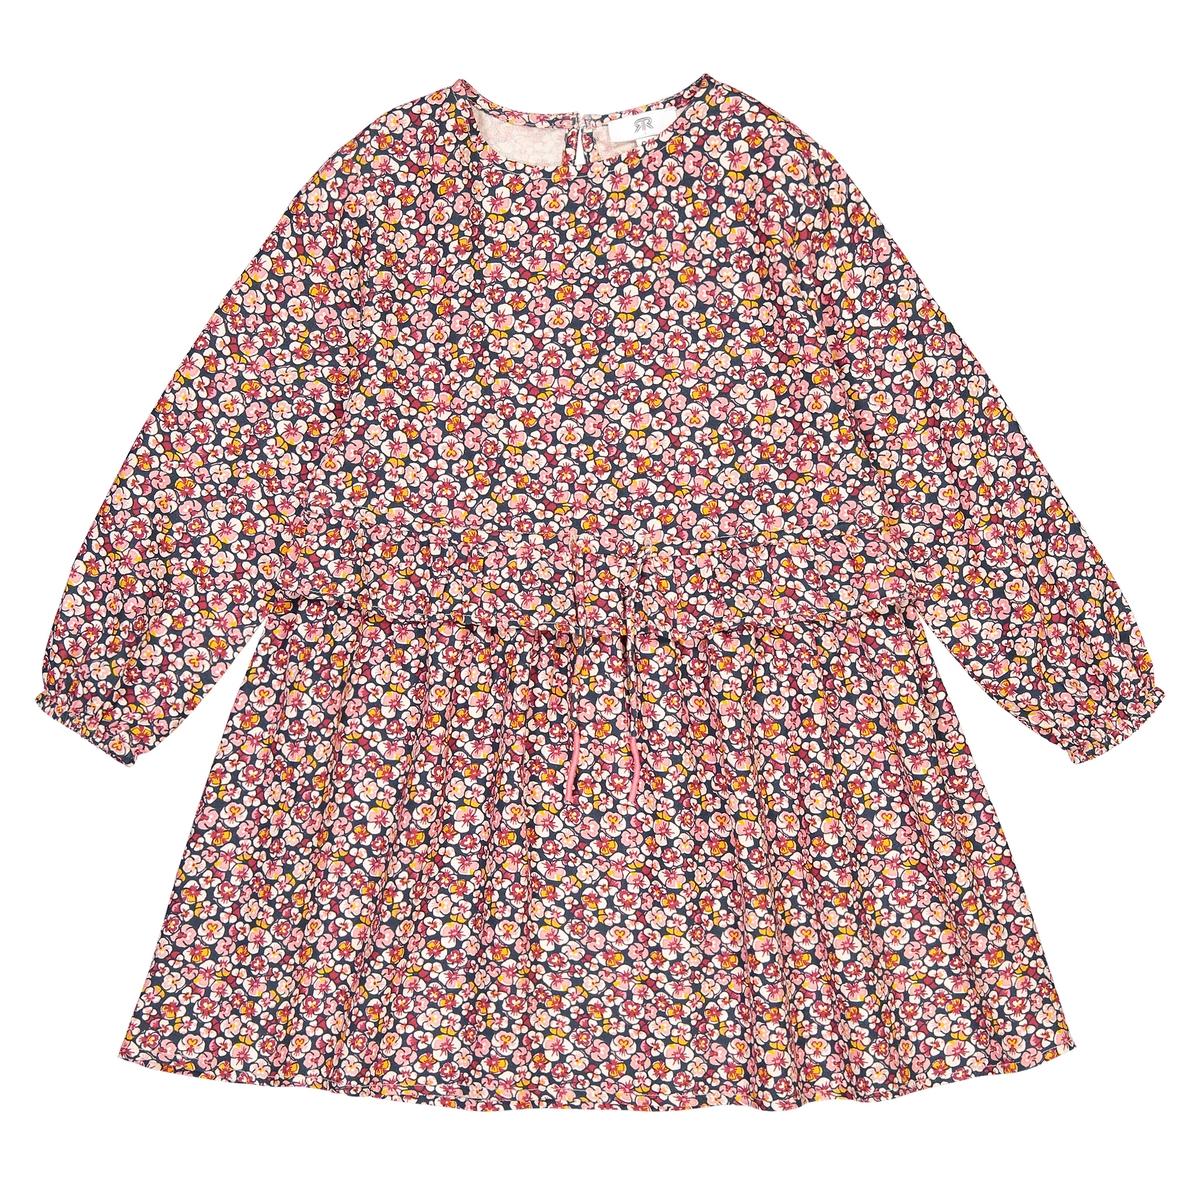 Vestido fluido de mangas compridas, motivo floral, 3-12 anos